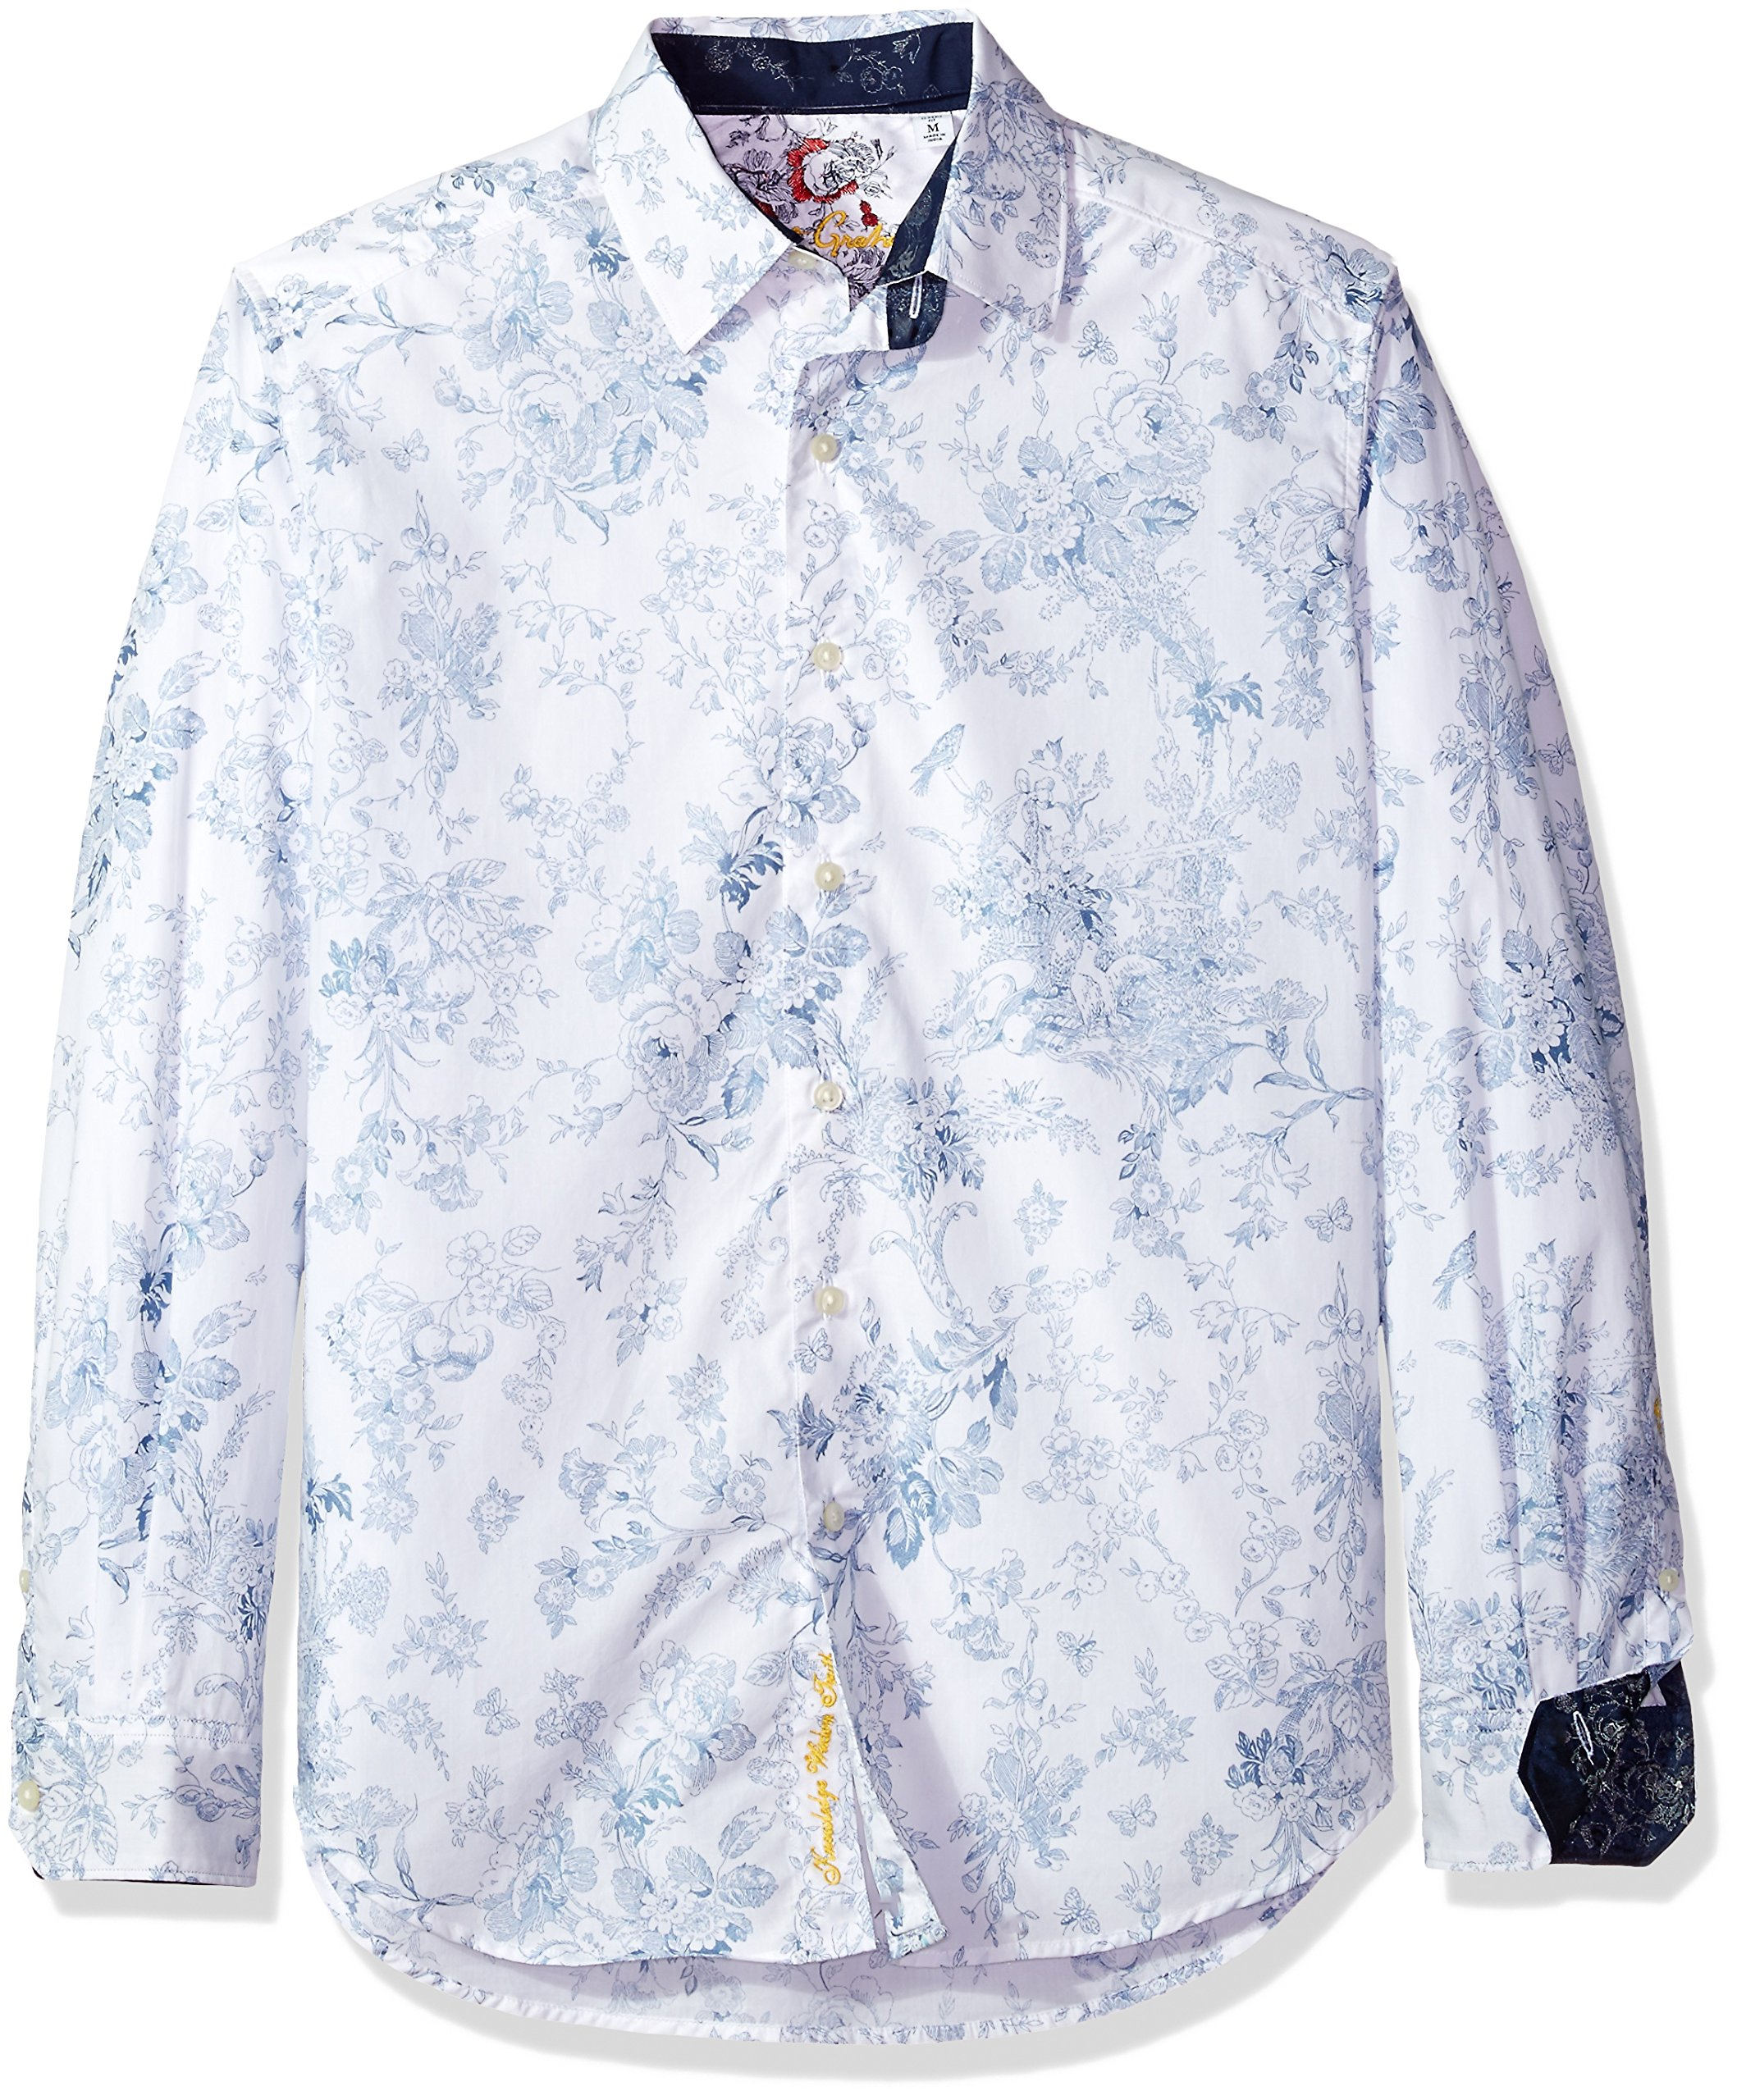 Robert Graham Men's Rider Classic Fit Cotton Sport Shirt, White, XLarge